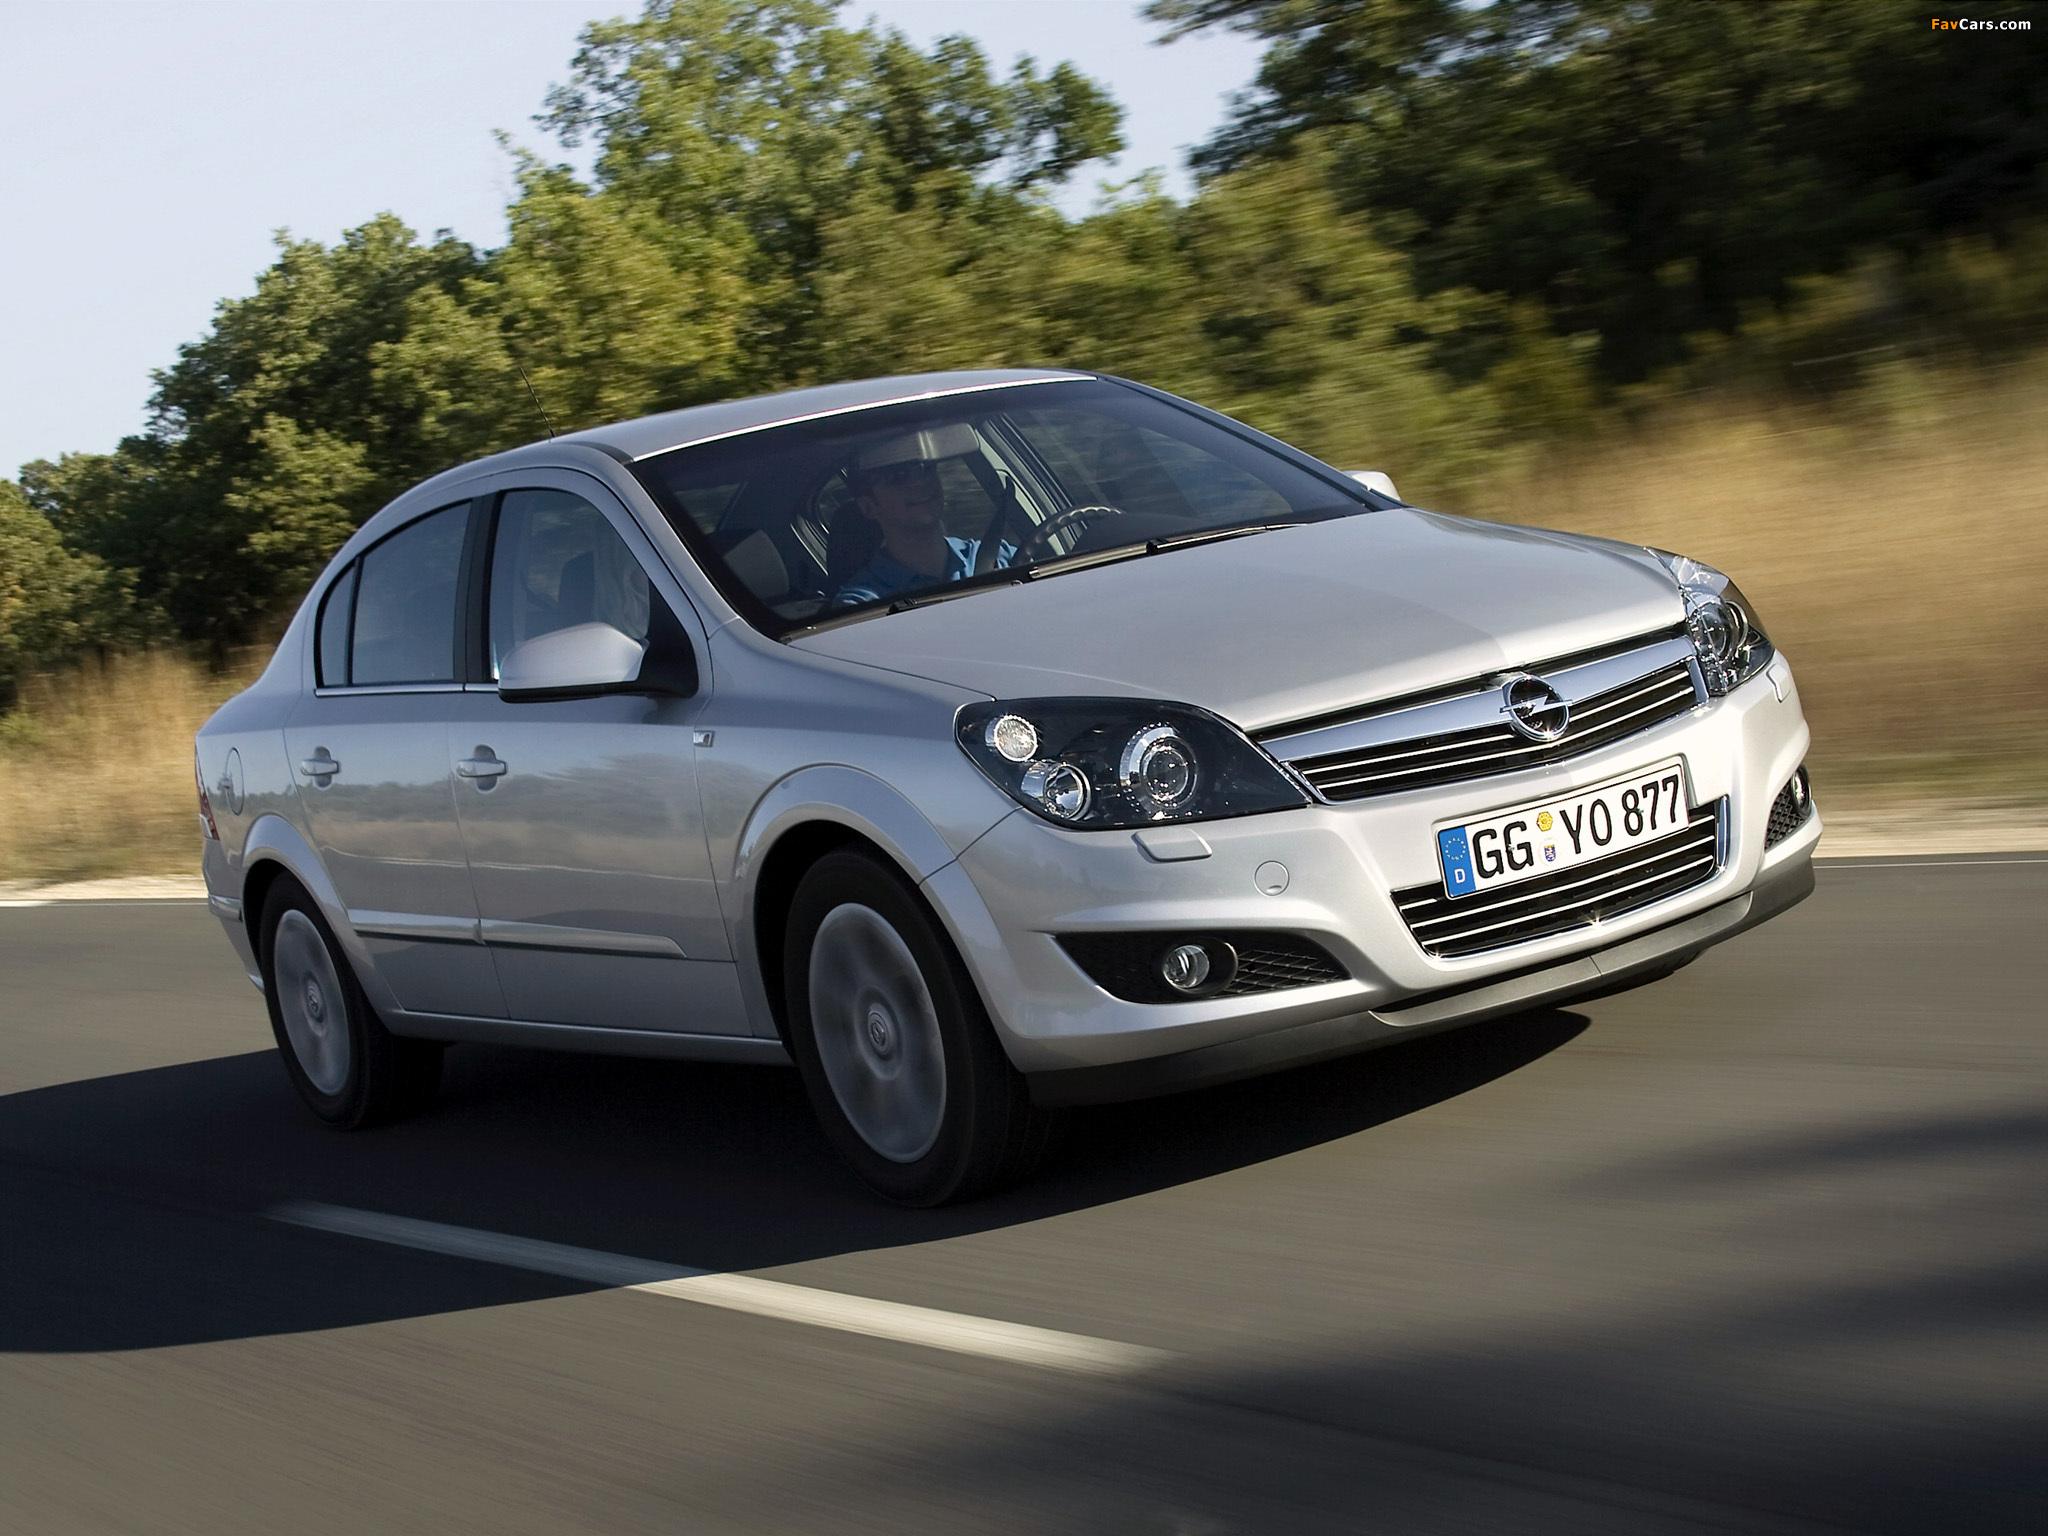 Opel Astra Sedan (H) 2007 wallpapers (2048 x 1536)